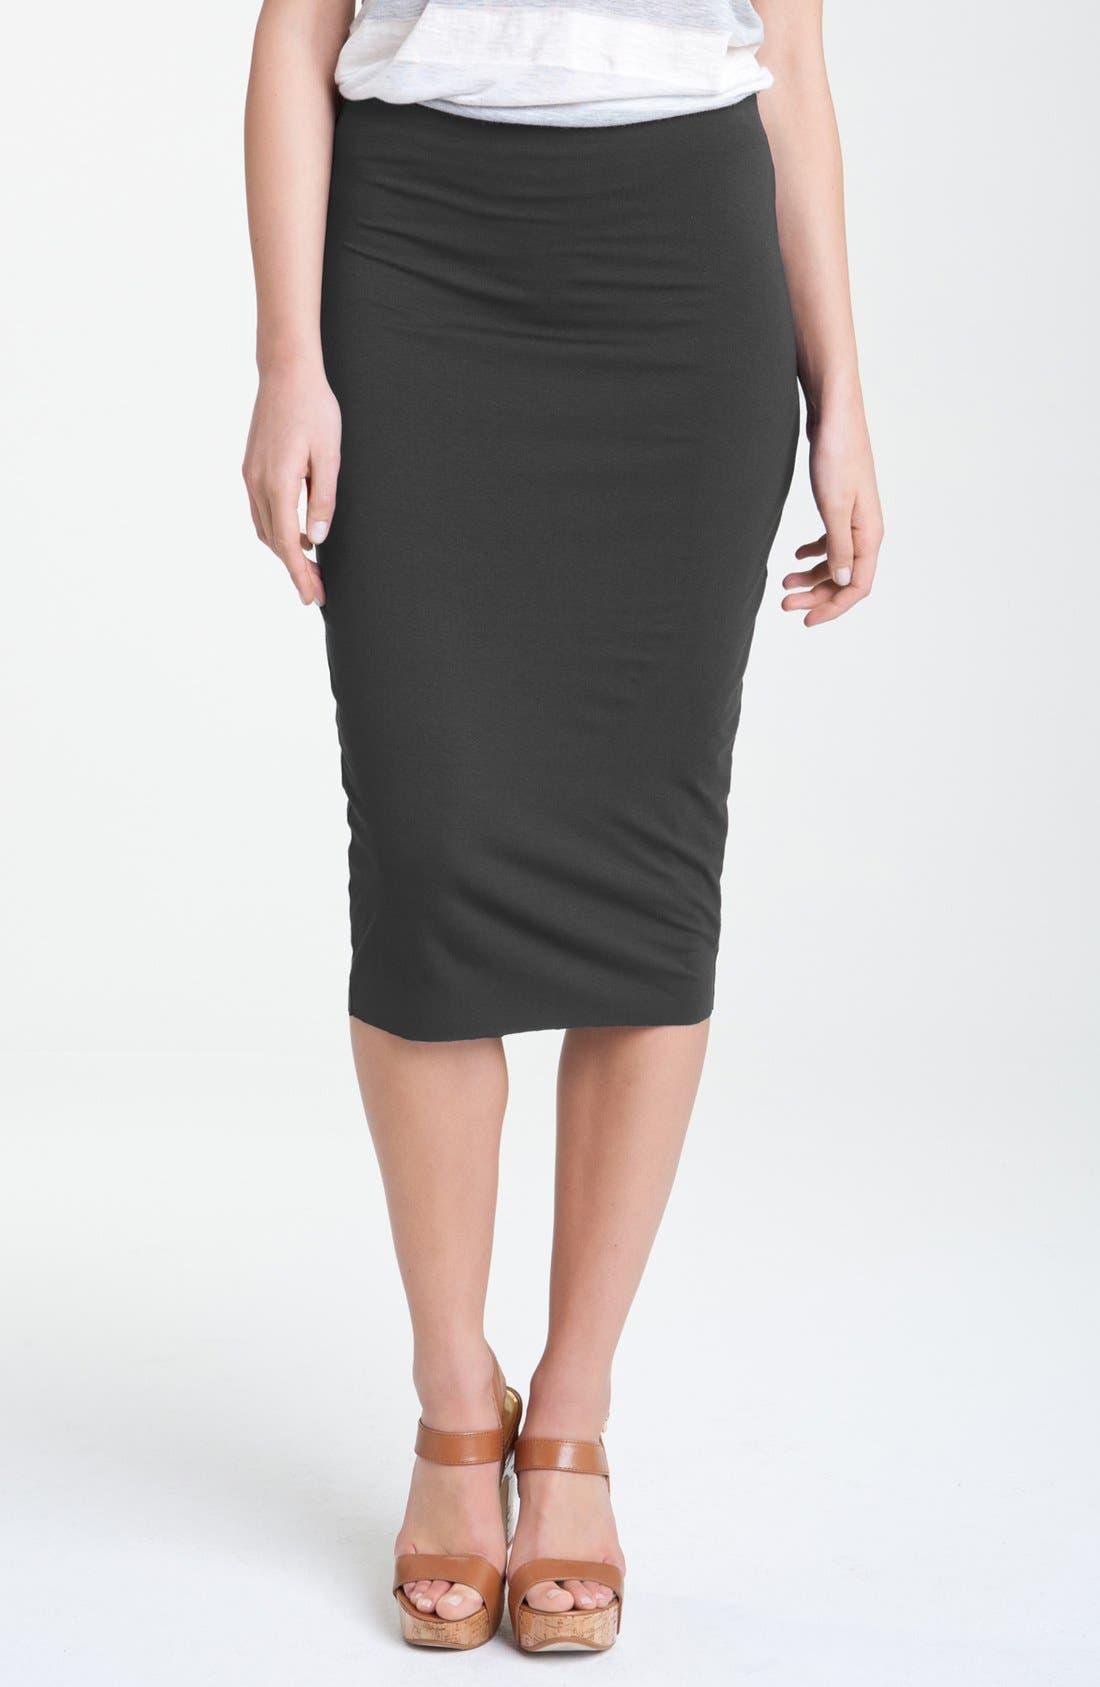 Alternate Image 1 Selected - Vince Camuto Stretch Knit Midi Tube Skirt (Petite)